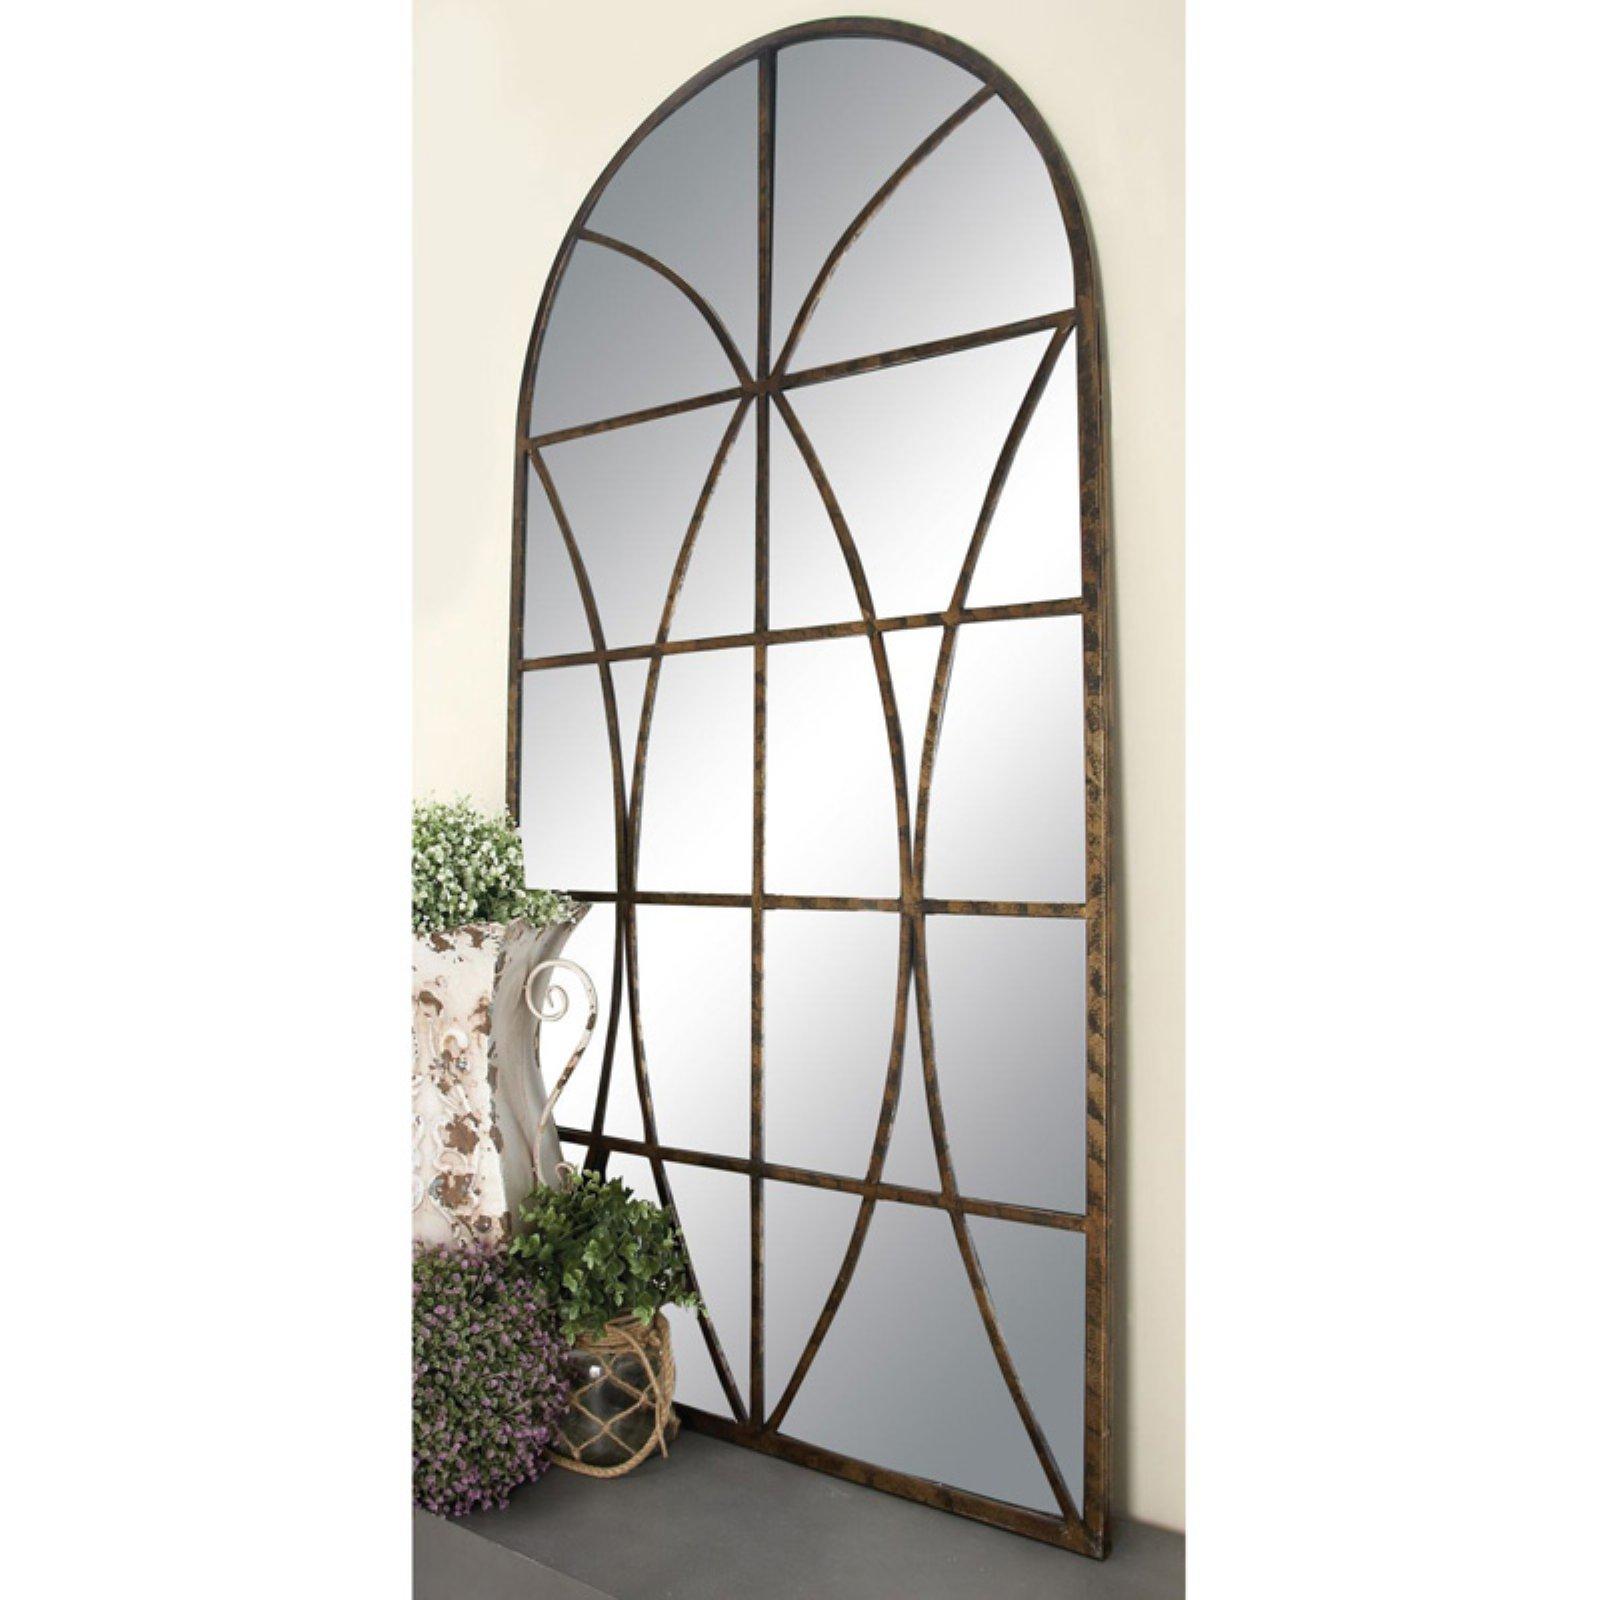 Decmode Metal and Wood Window Pane Arch Mirror, Brown